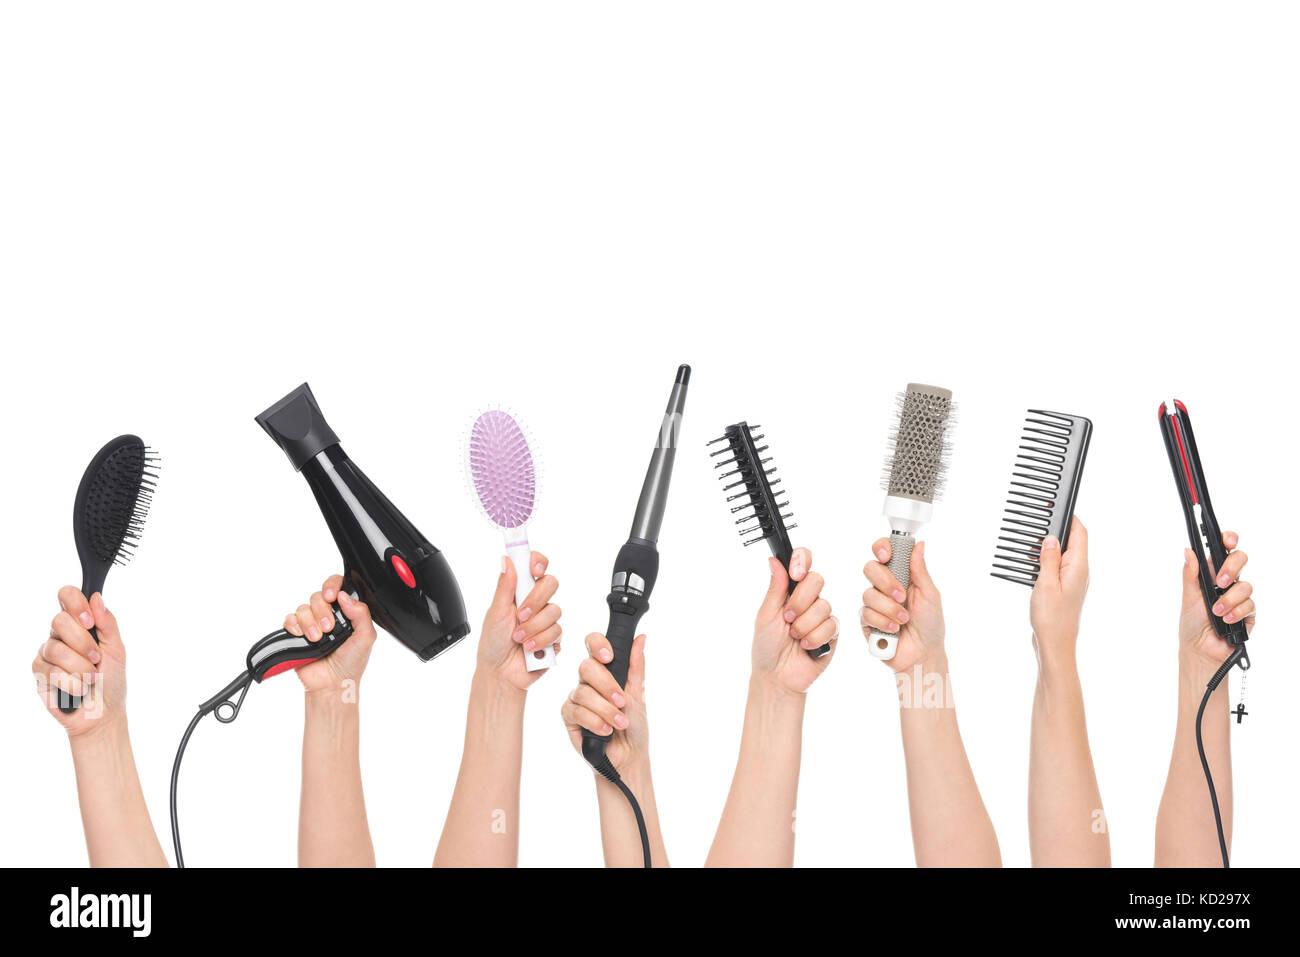 Hairdressing Equipment Stock Photos Amp Hairdressing